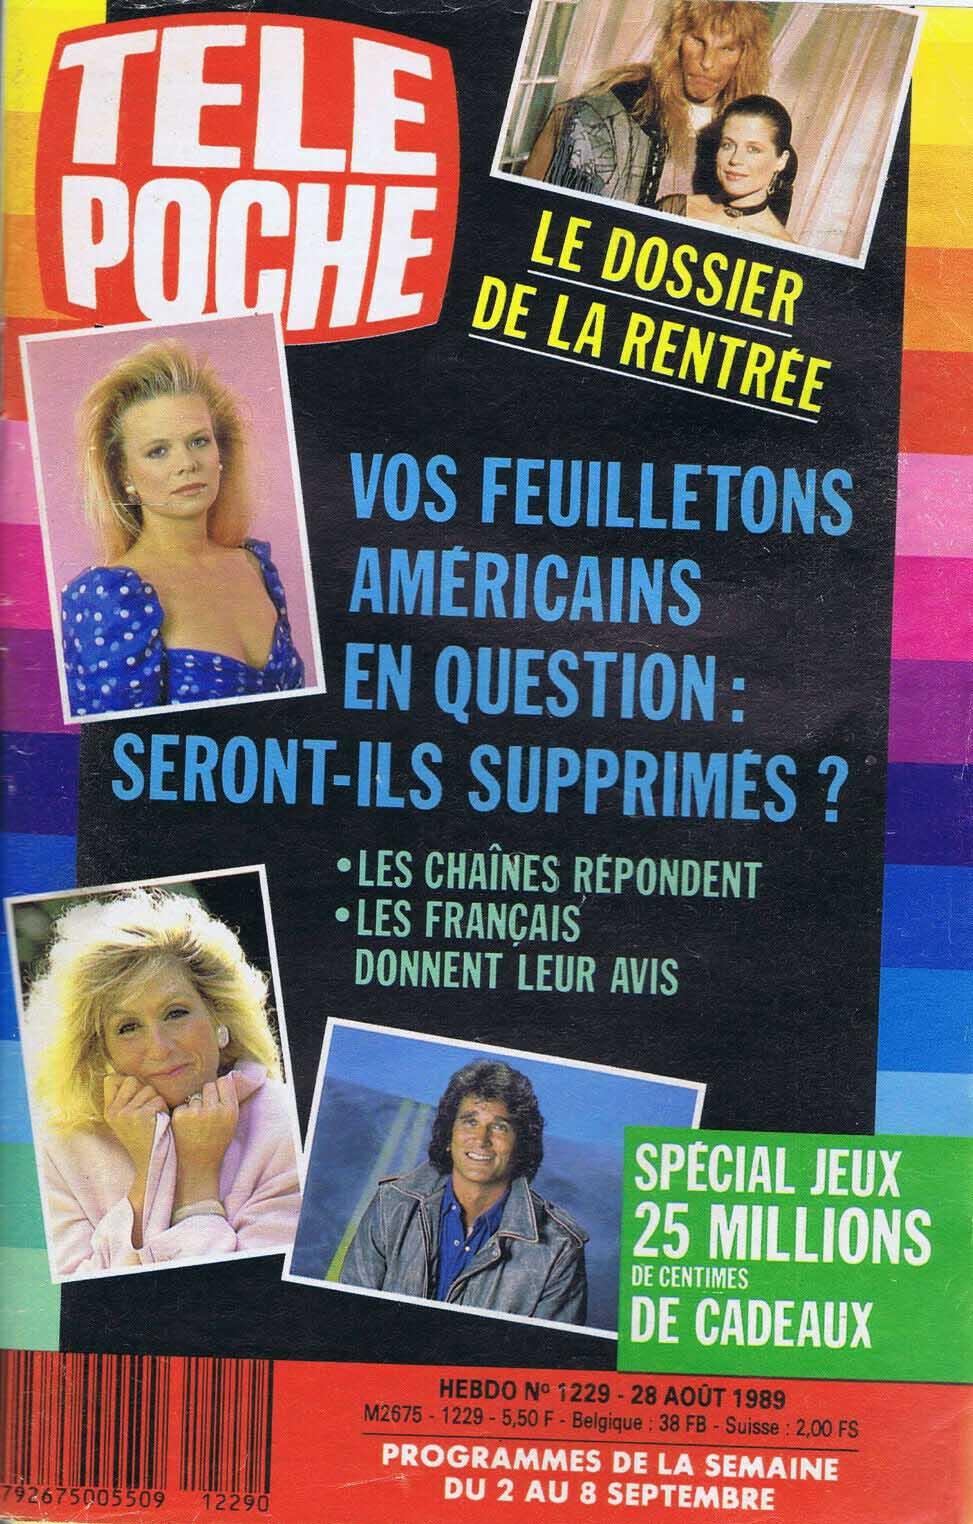 2 au 8 septembre 1989